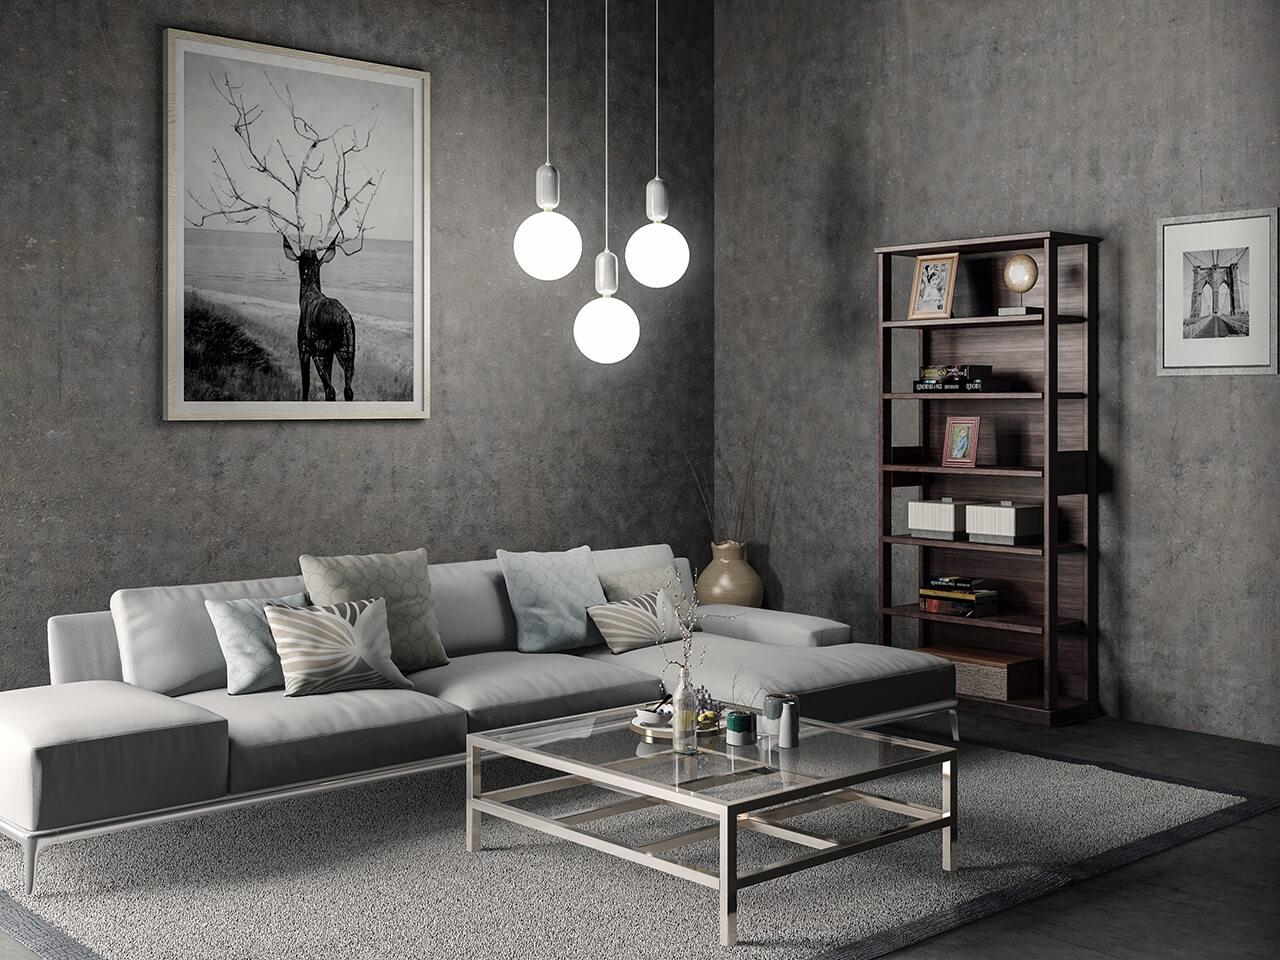 The Interior Design Of A Grey Modern Living Room